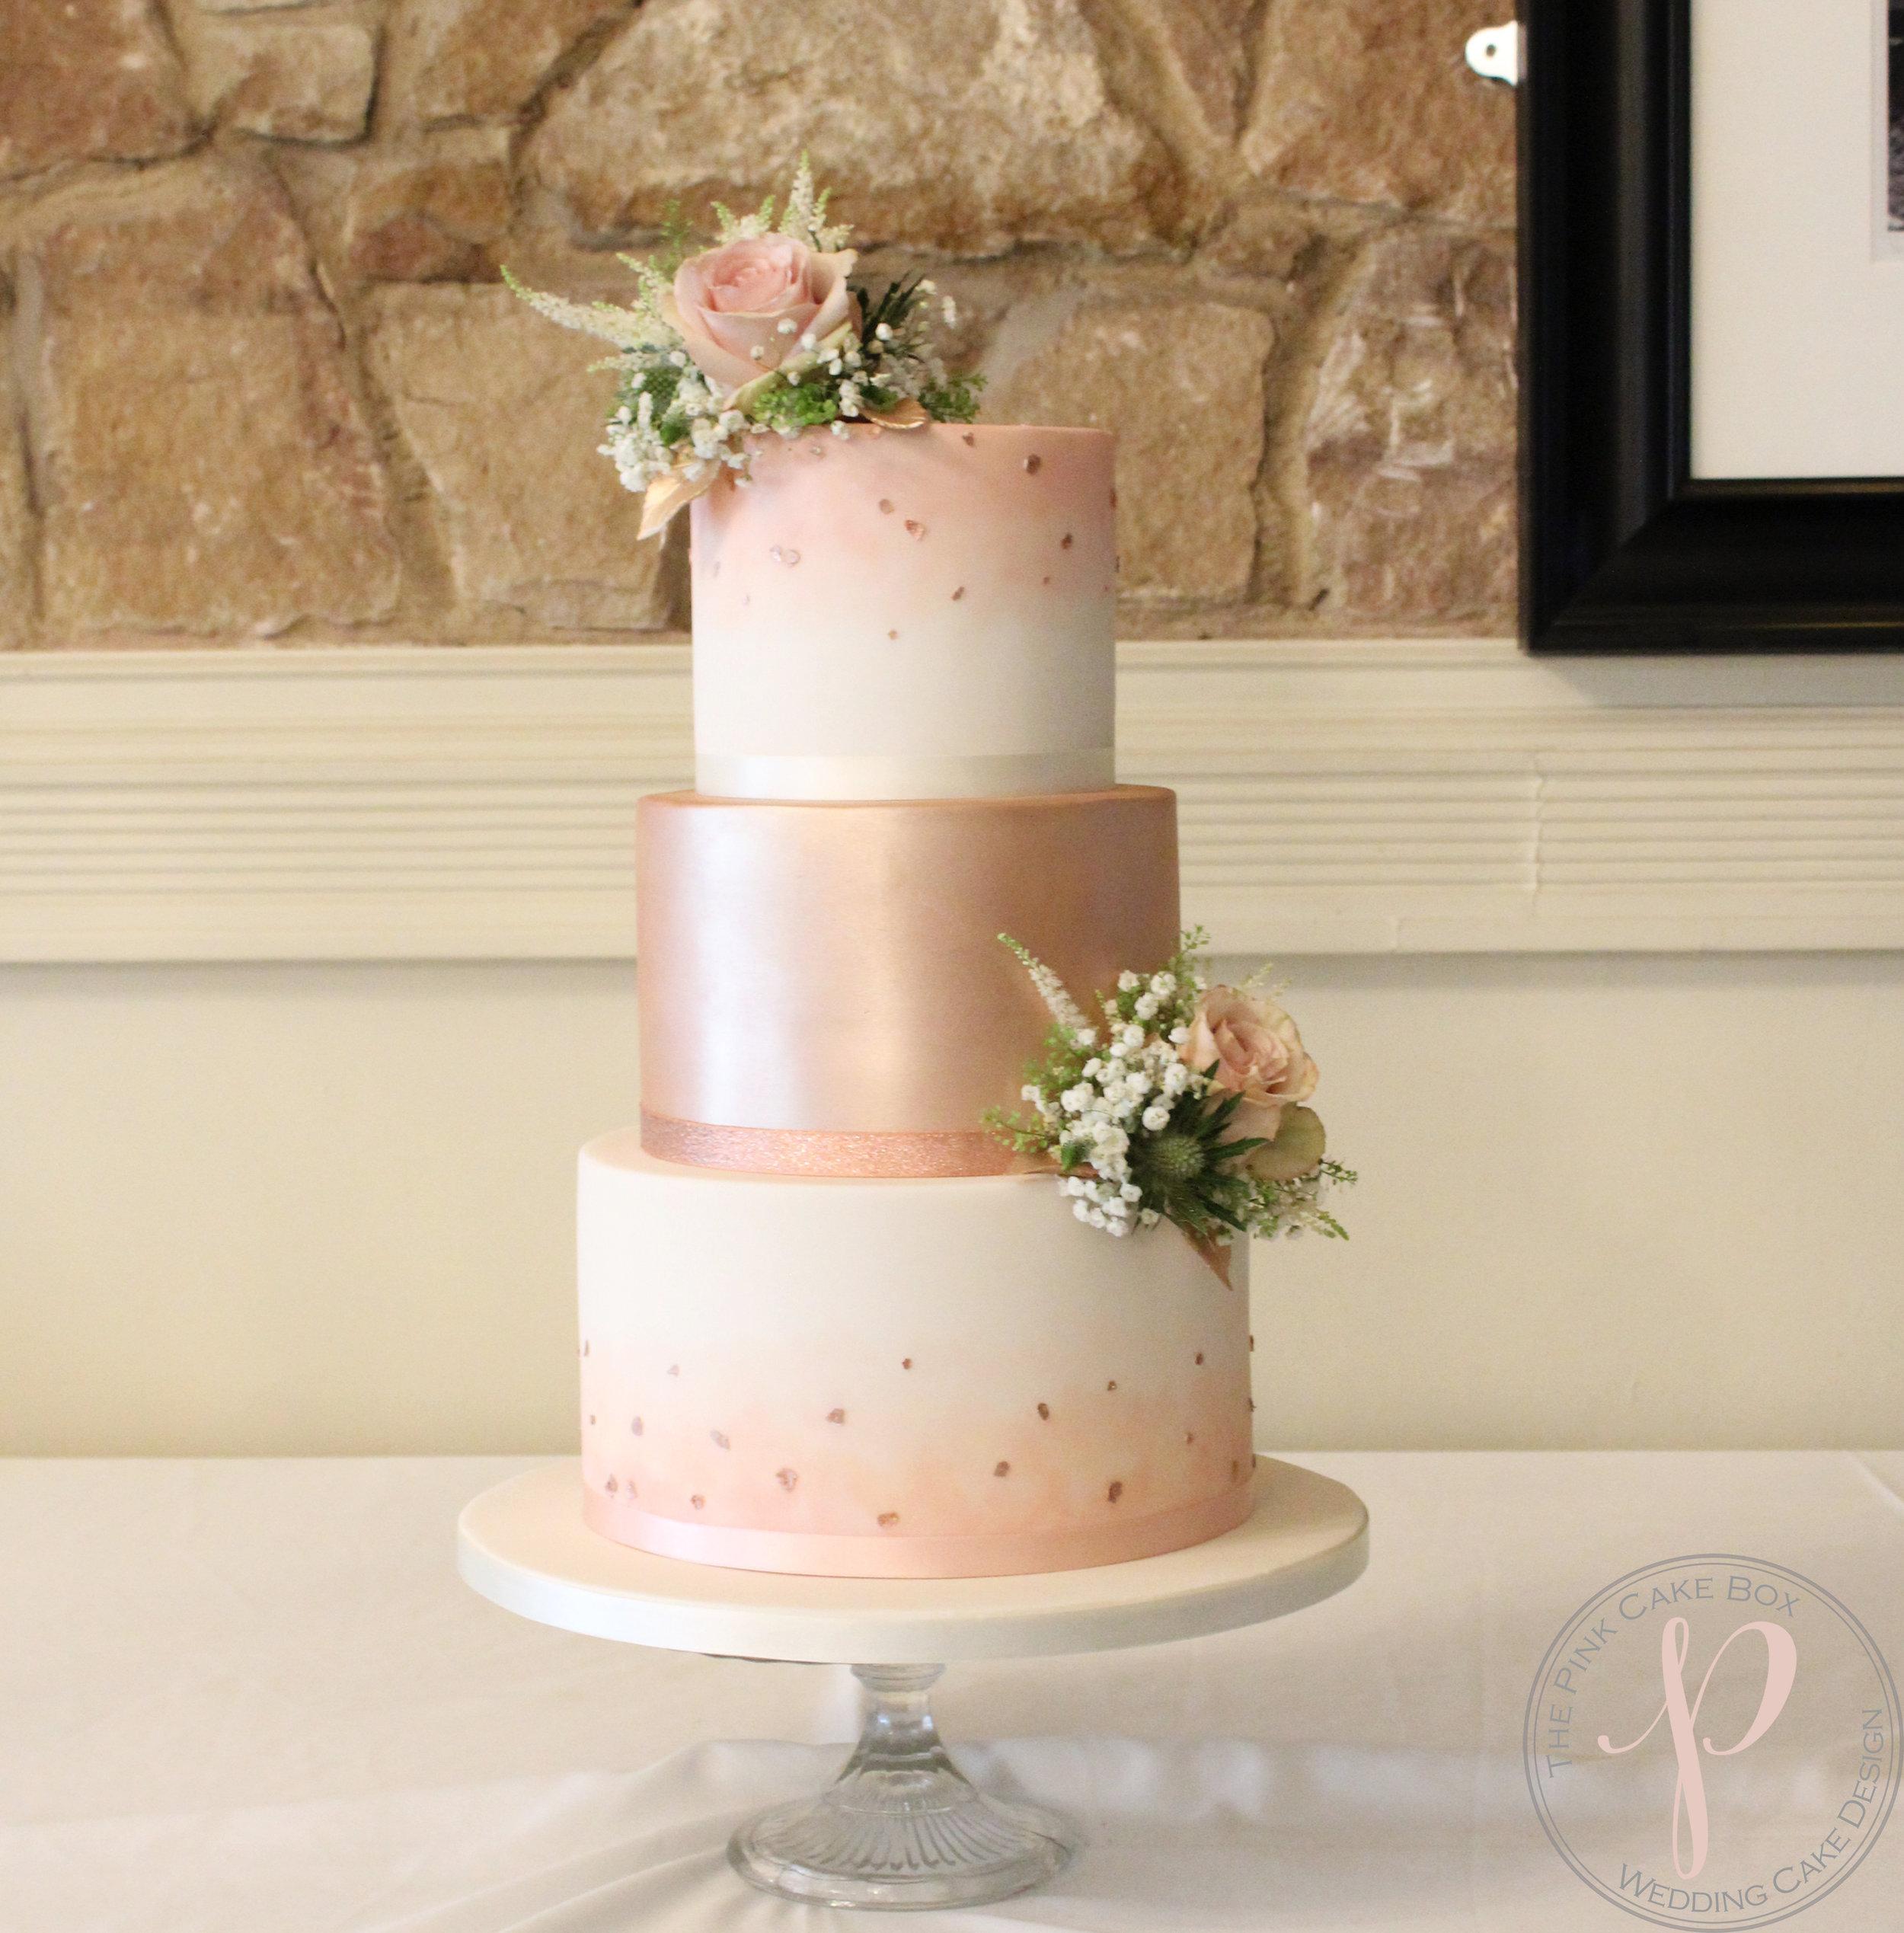 Elegant Wedding Cakes The Pink Cake Box Wedding Cake Design